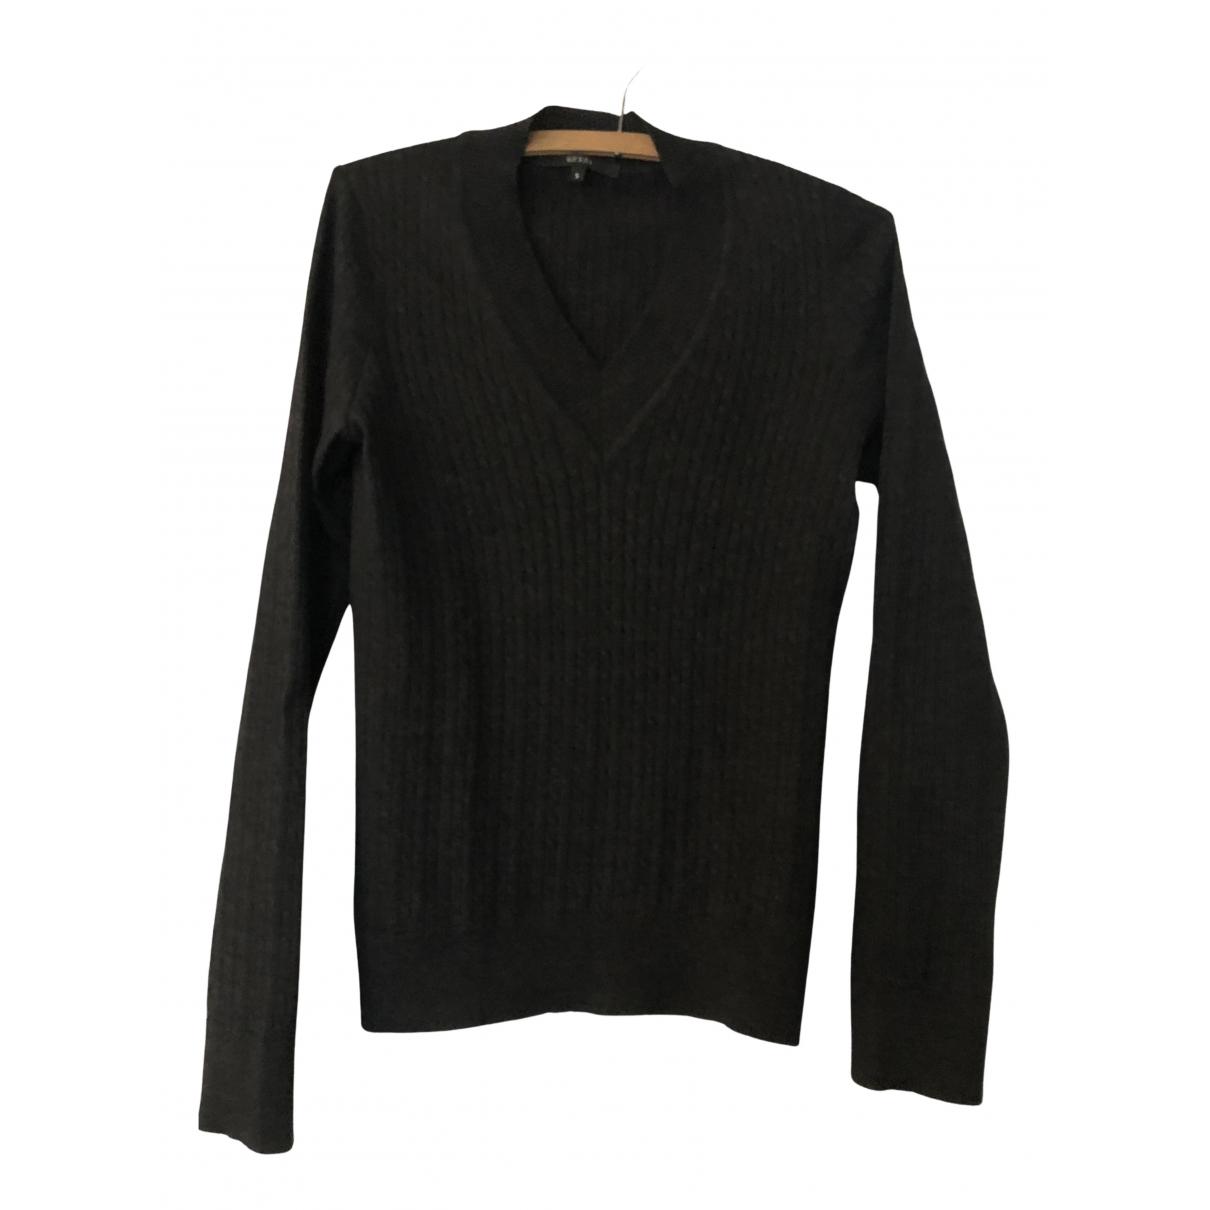 Gucci N Grey Wool Knitwear & Sweatshirts for Men S International